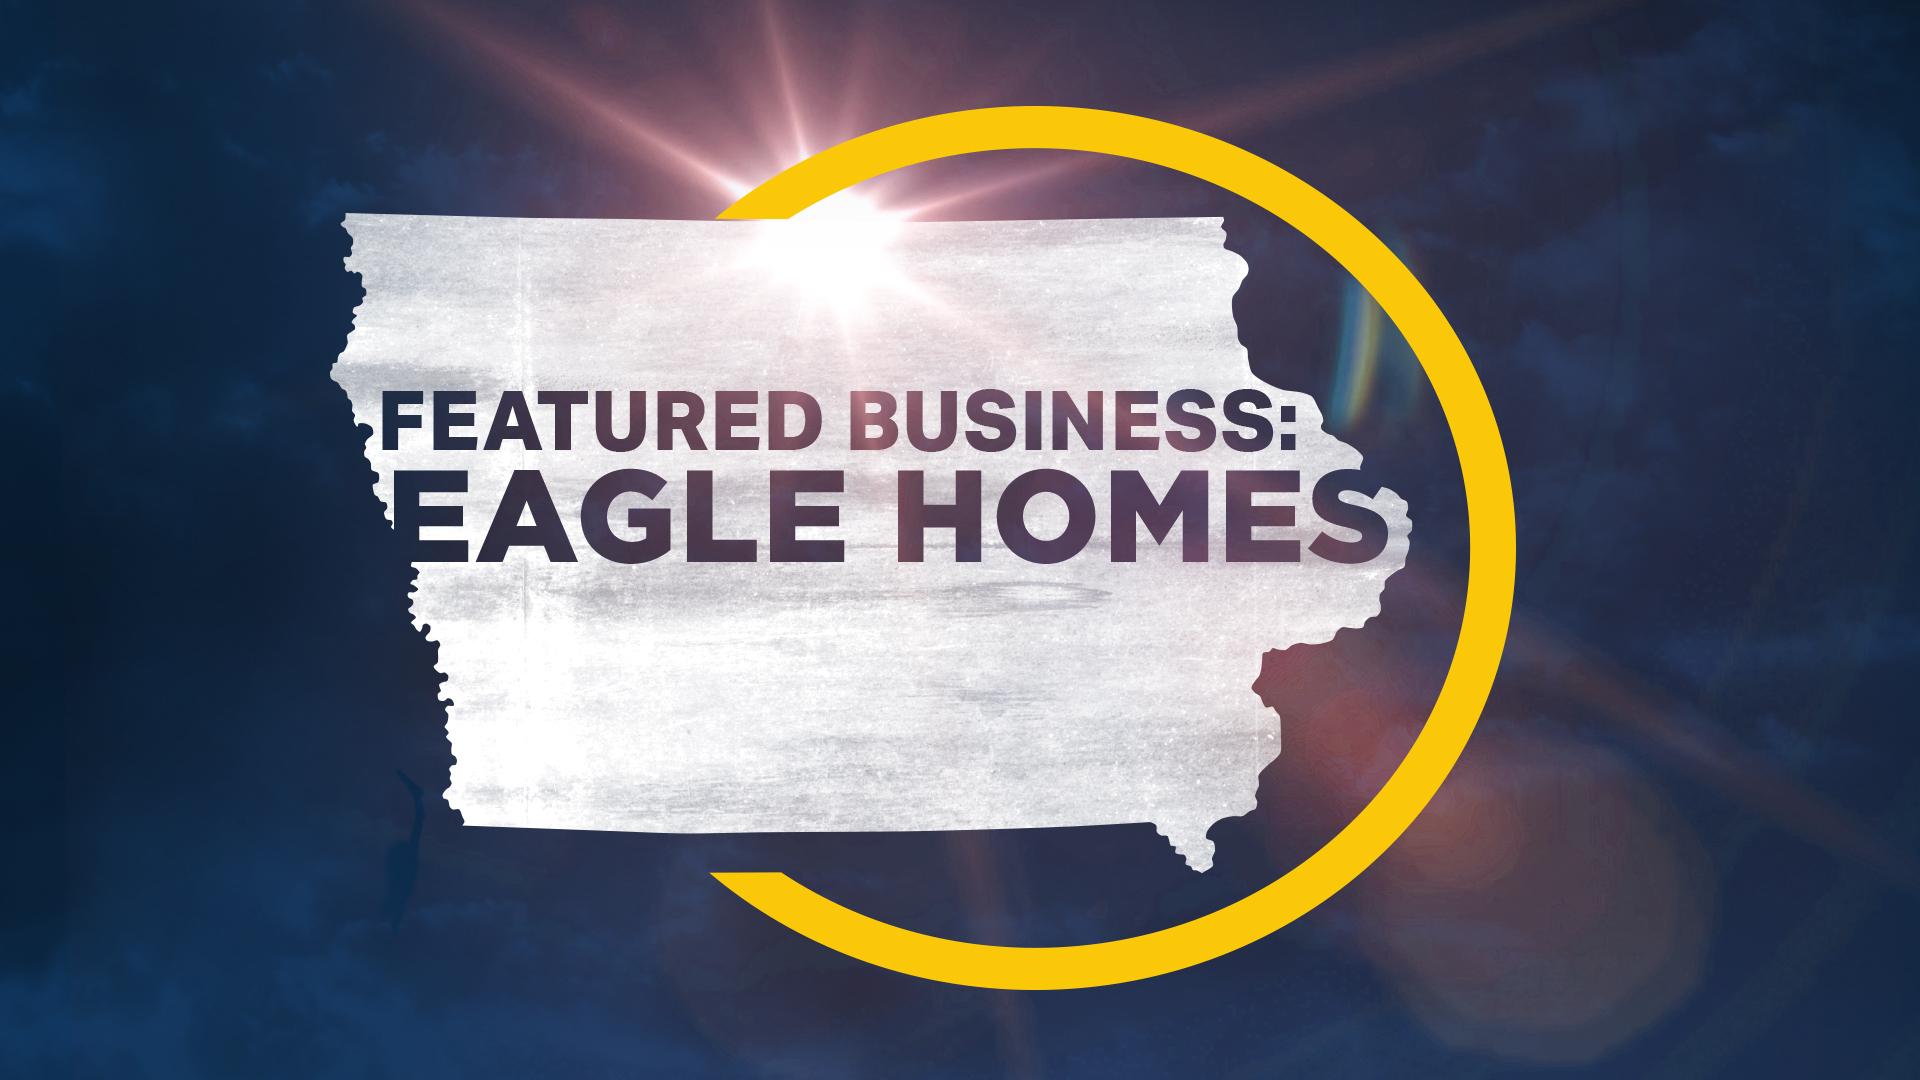 altoonanow eagle homes business feature